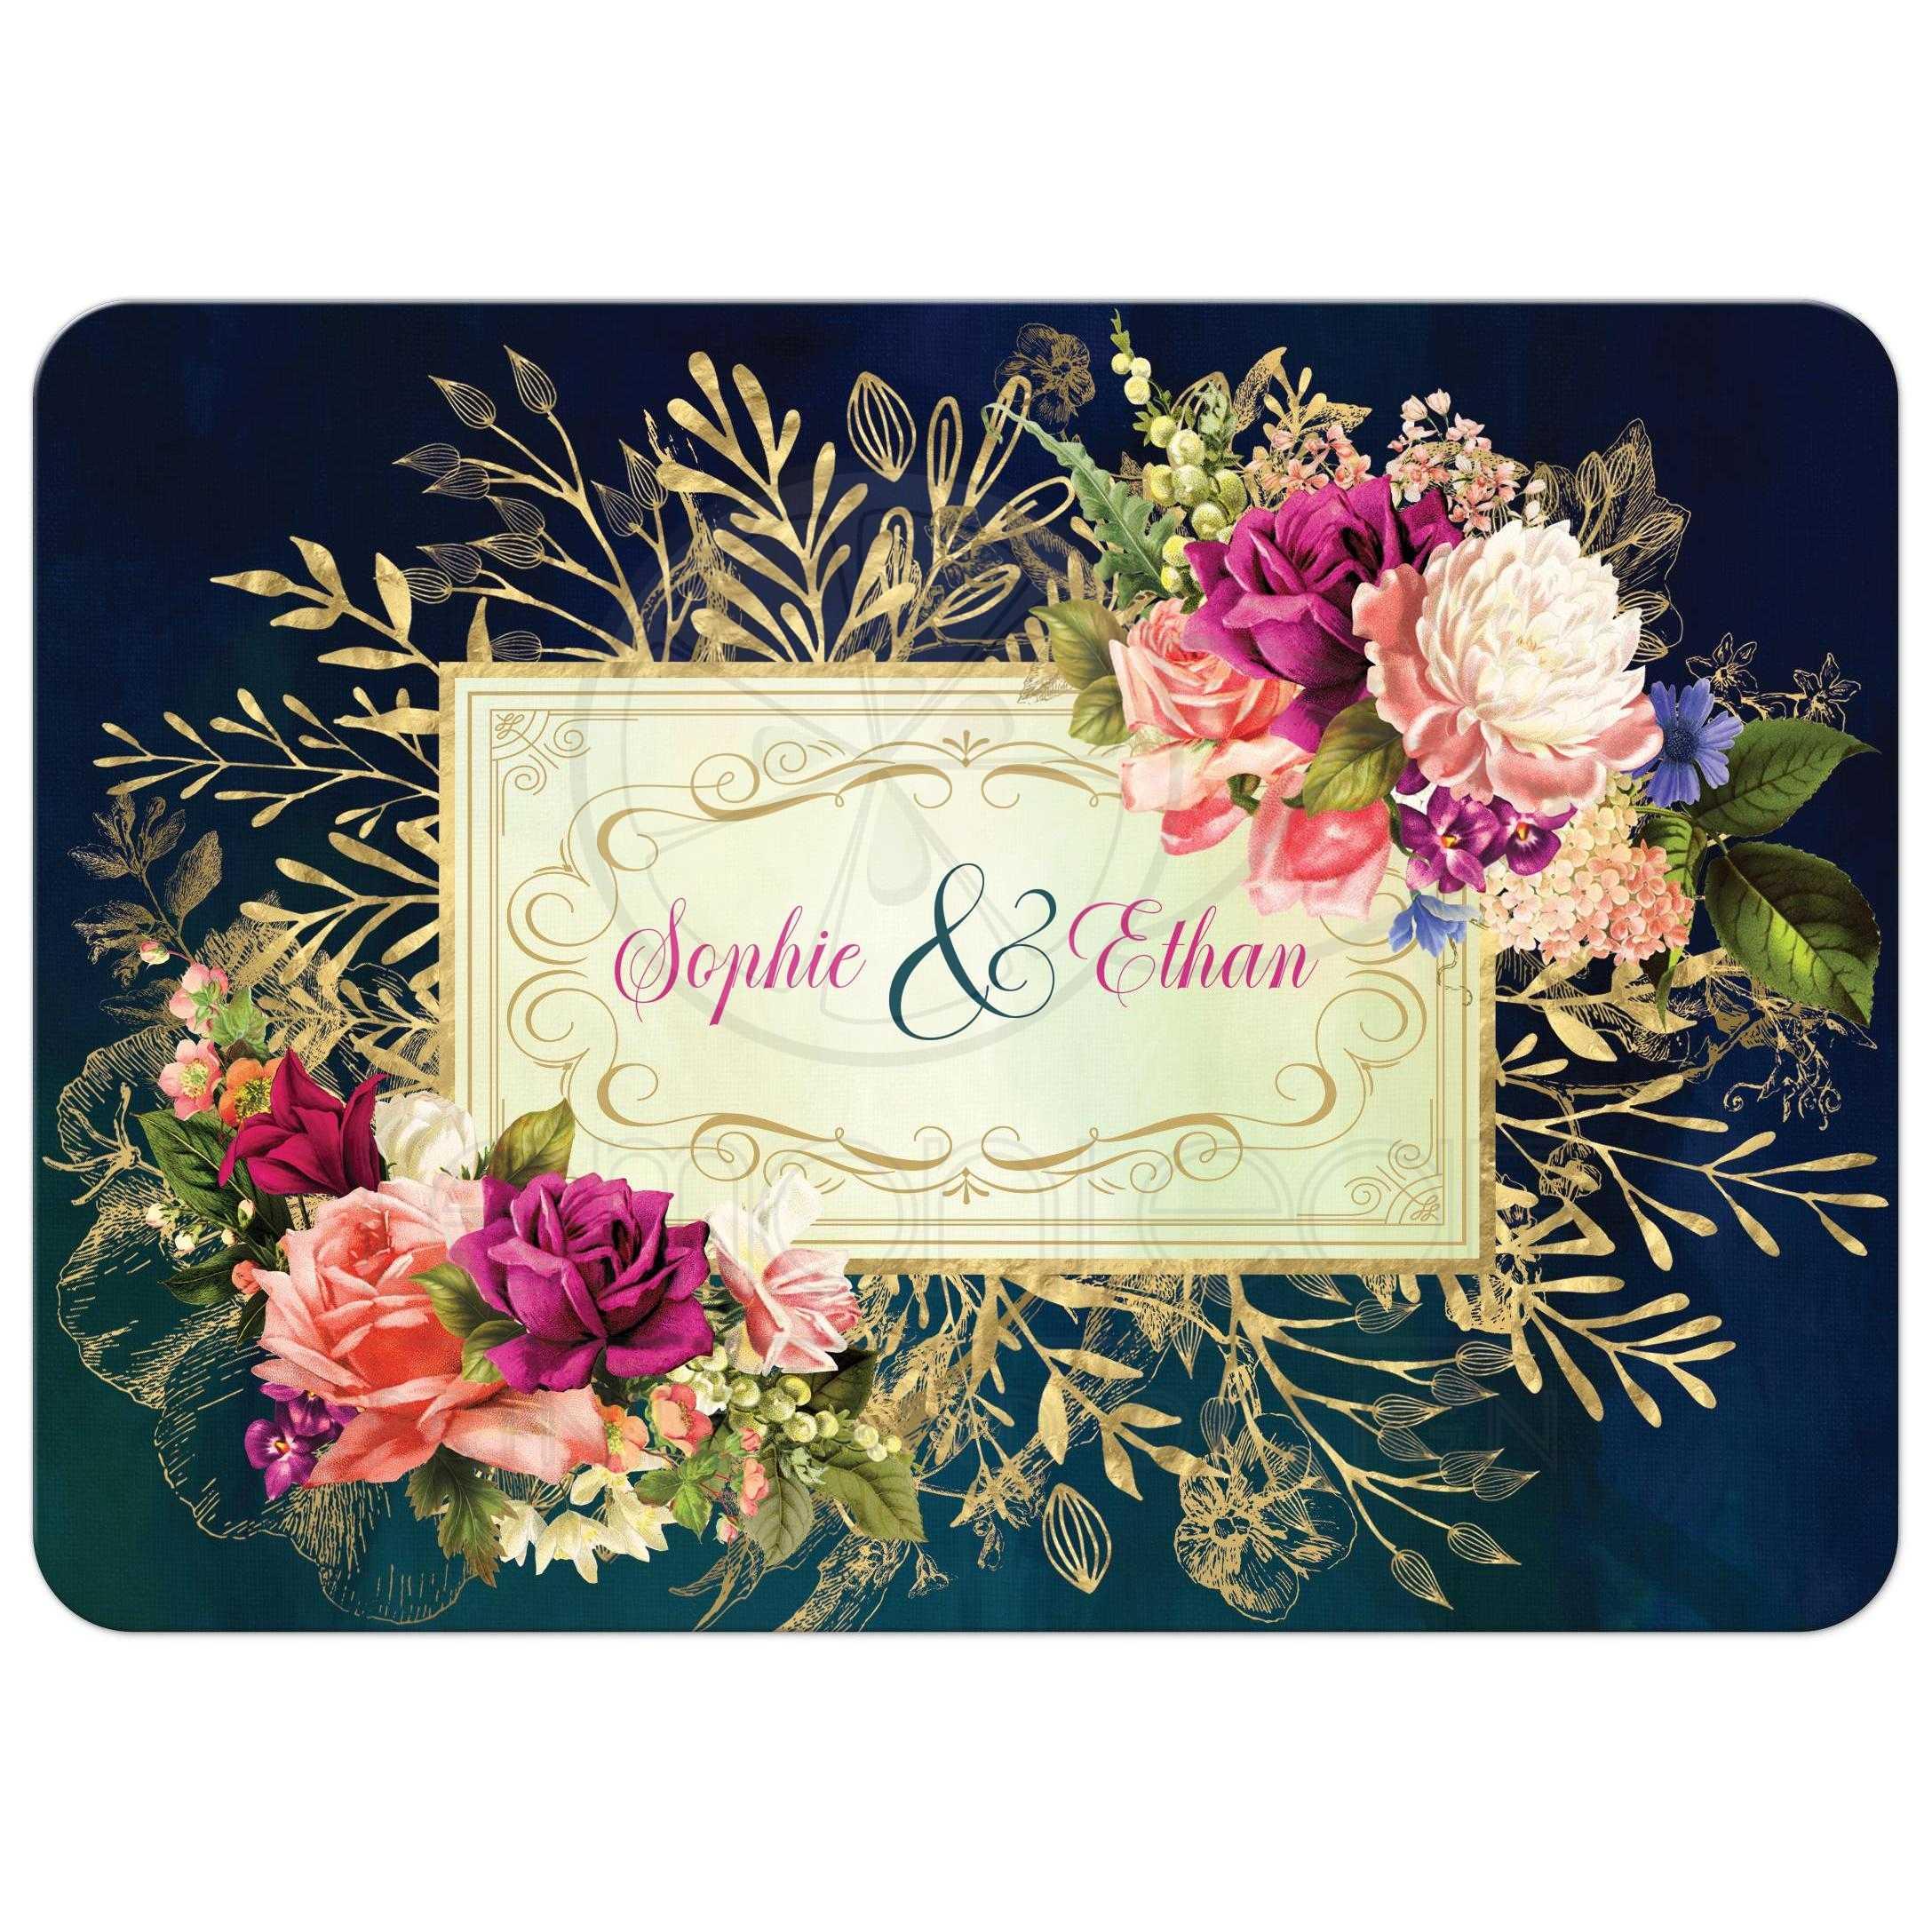 Teal Navy Green Gold Bold Florals Foliage Wedding Invitation